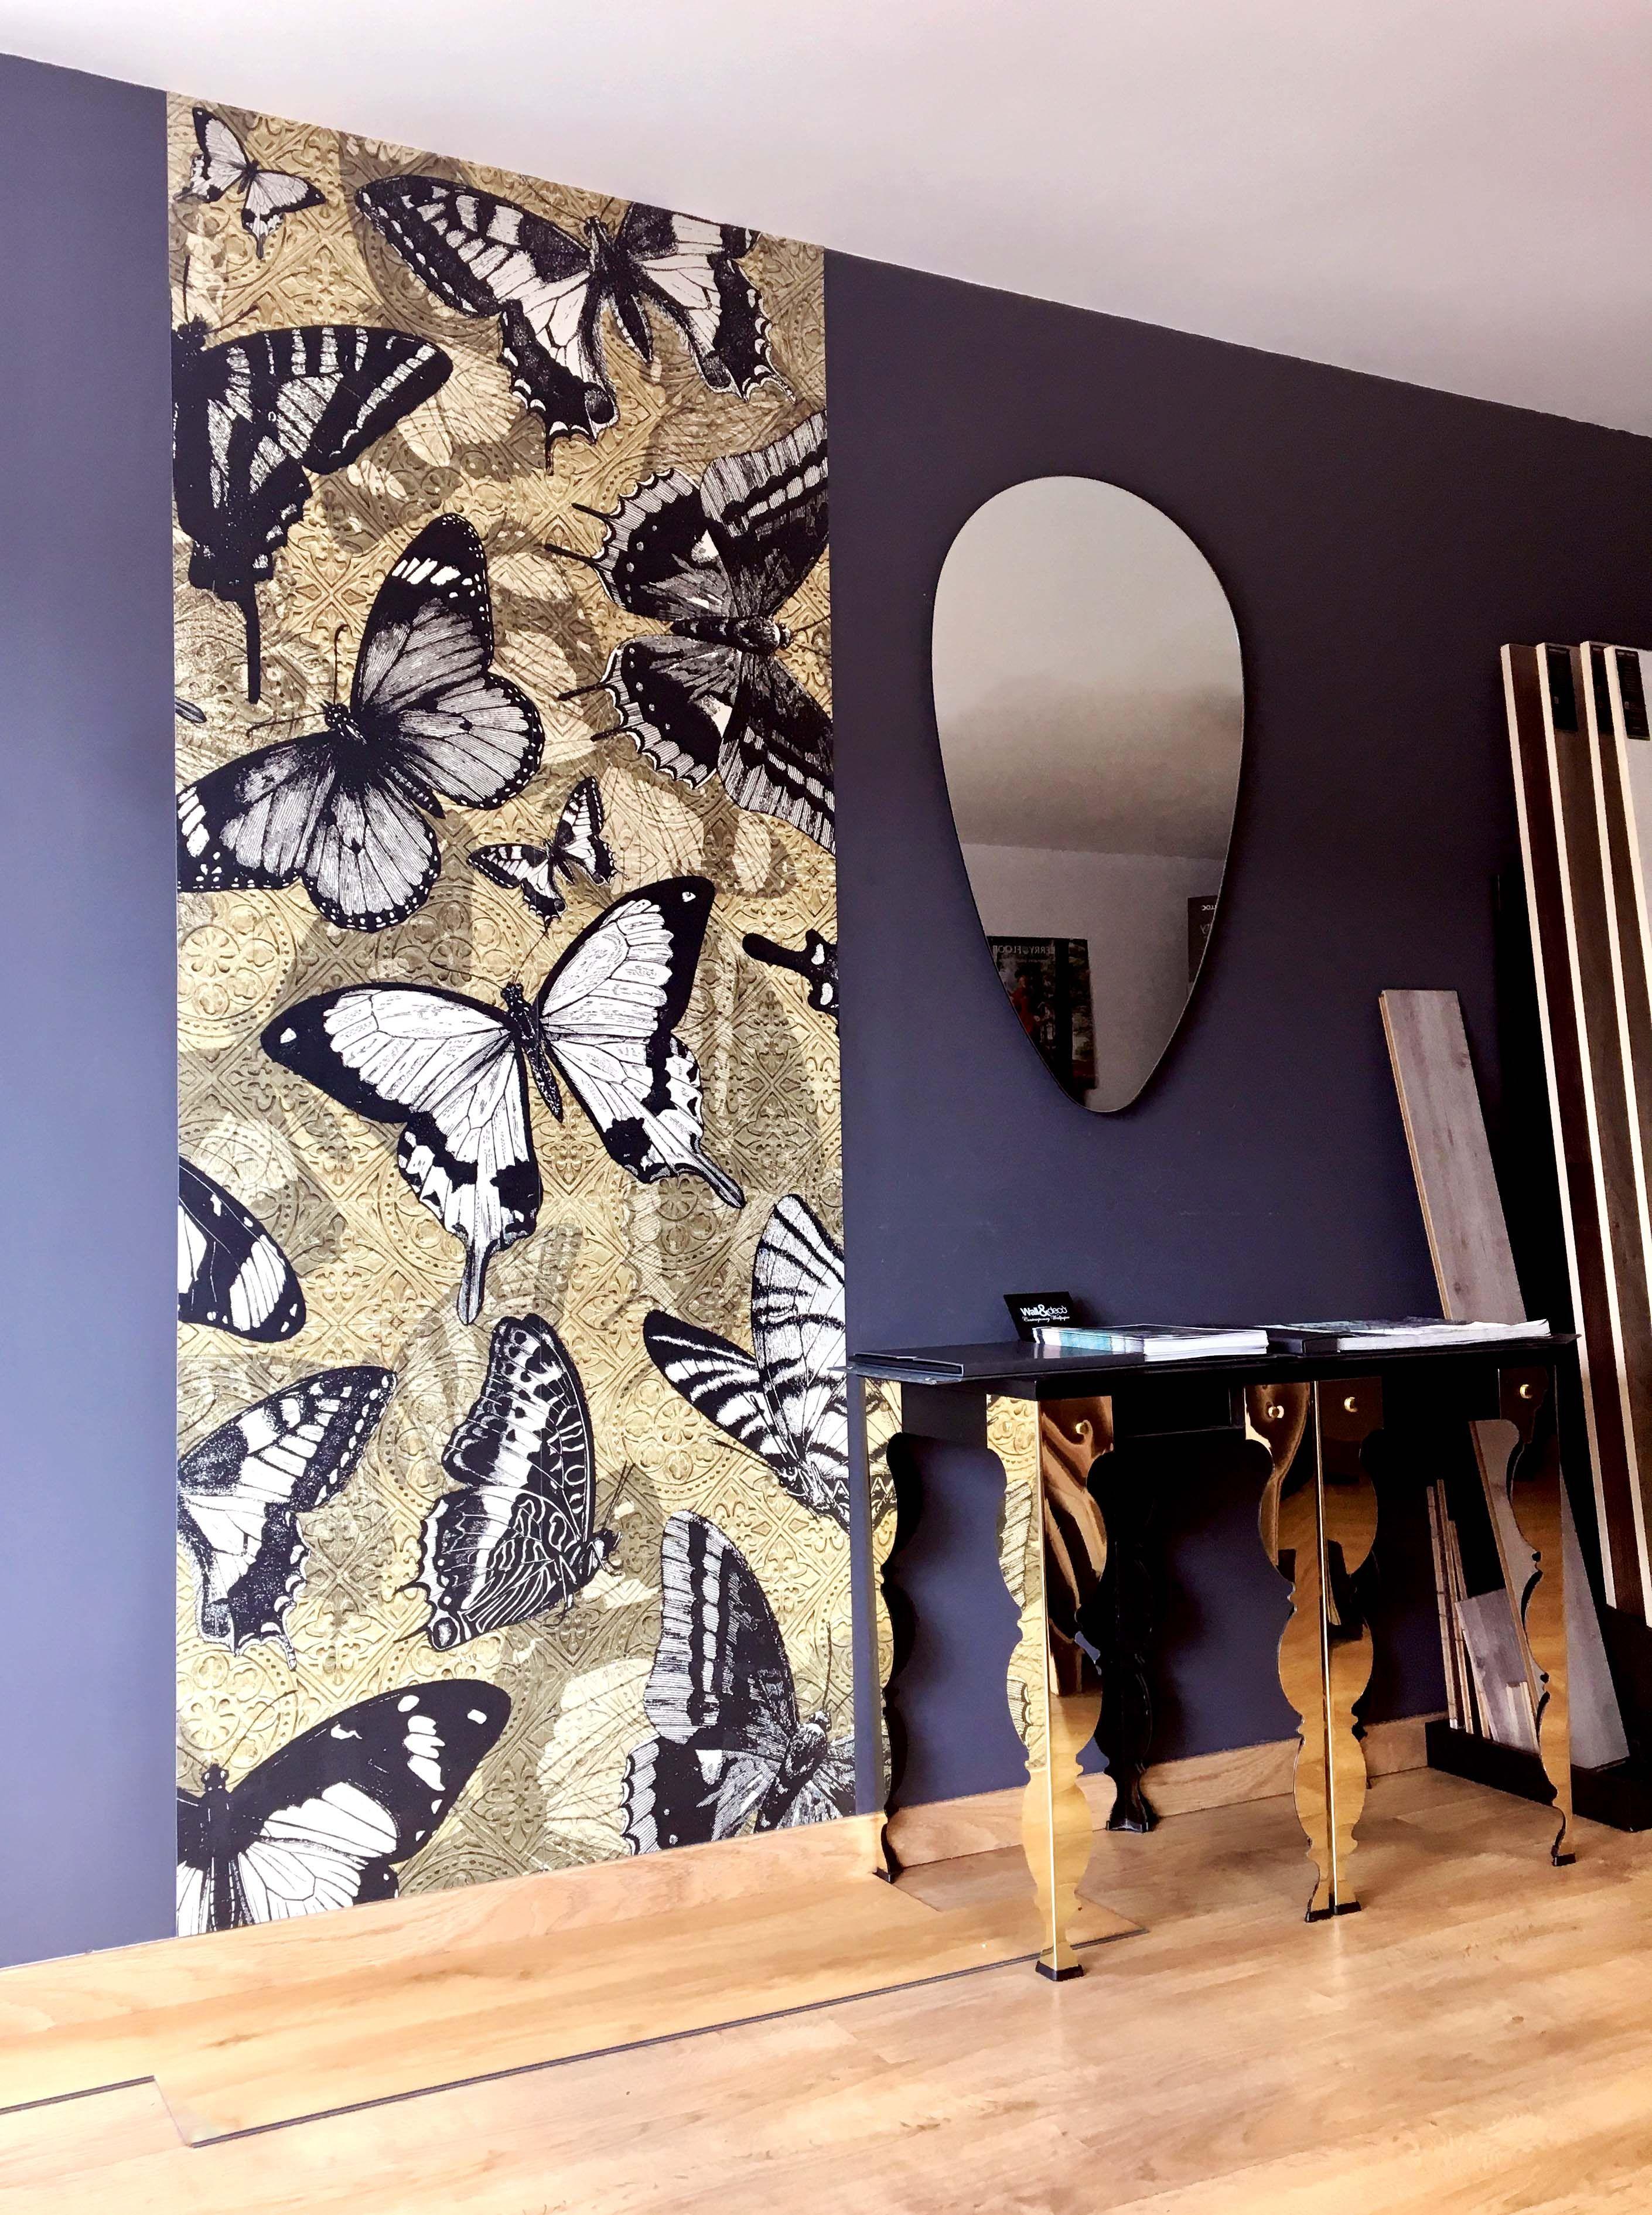 show room ajaccio corsica parquet papier peint papillons wallpaper showroom pinterest. Black Bedroom Furniture Sets. Home Design Ideas